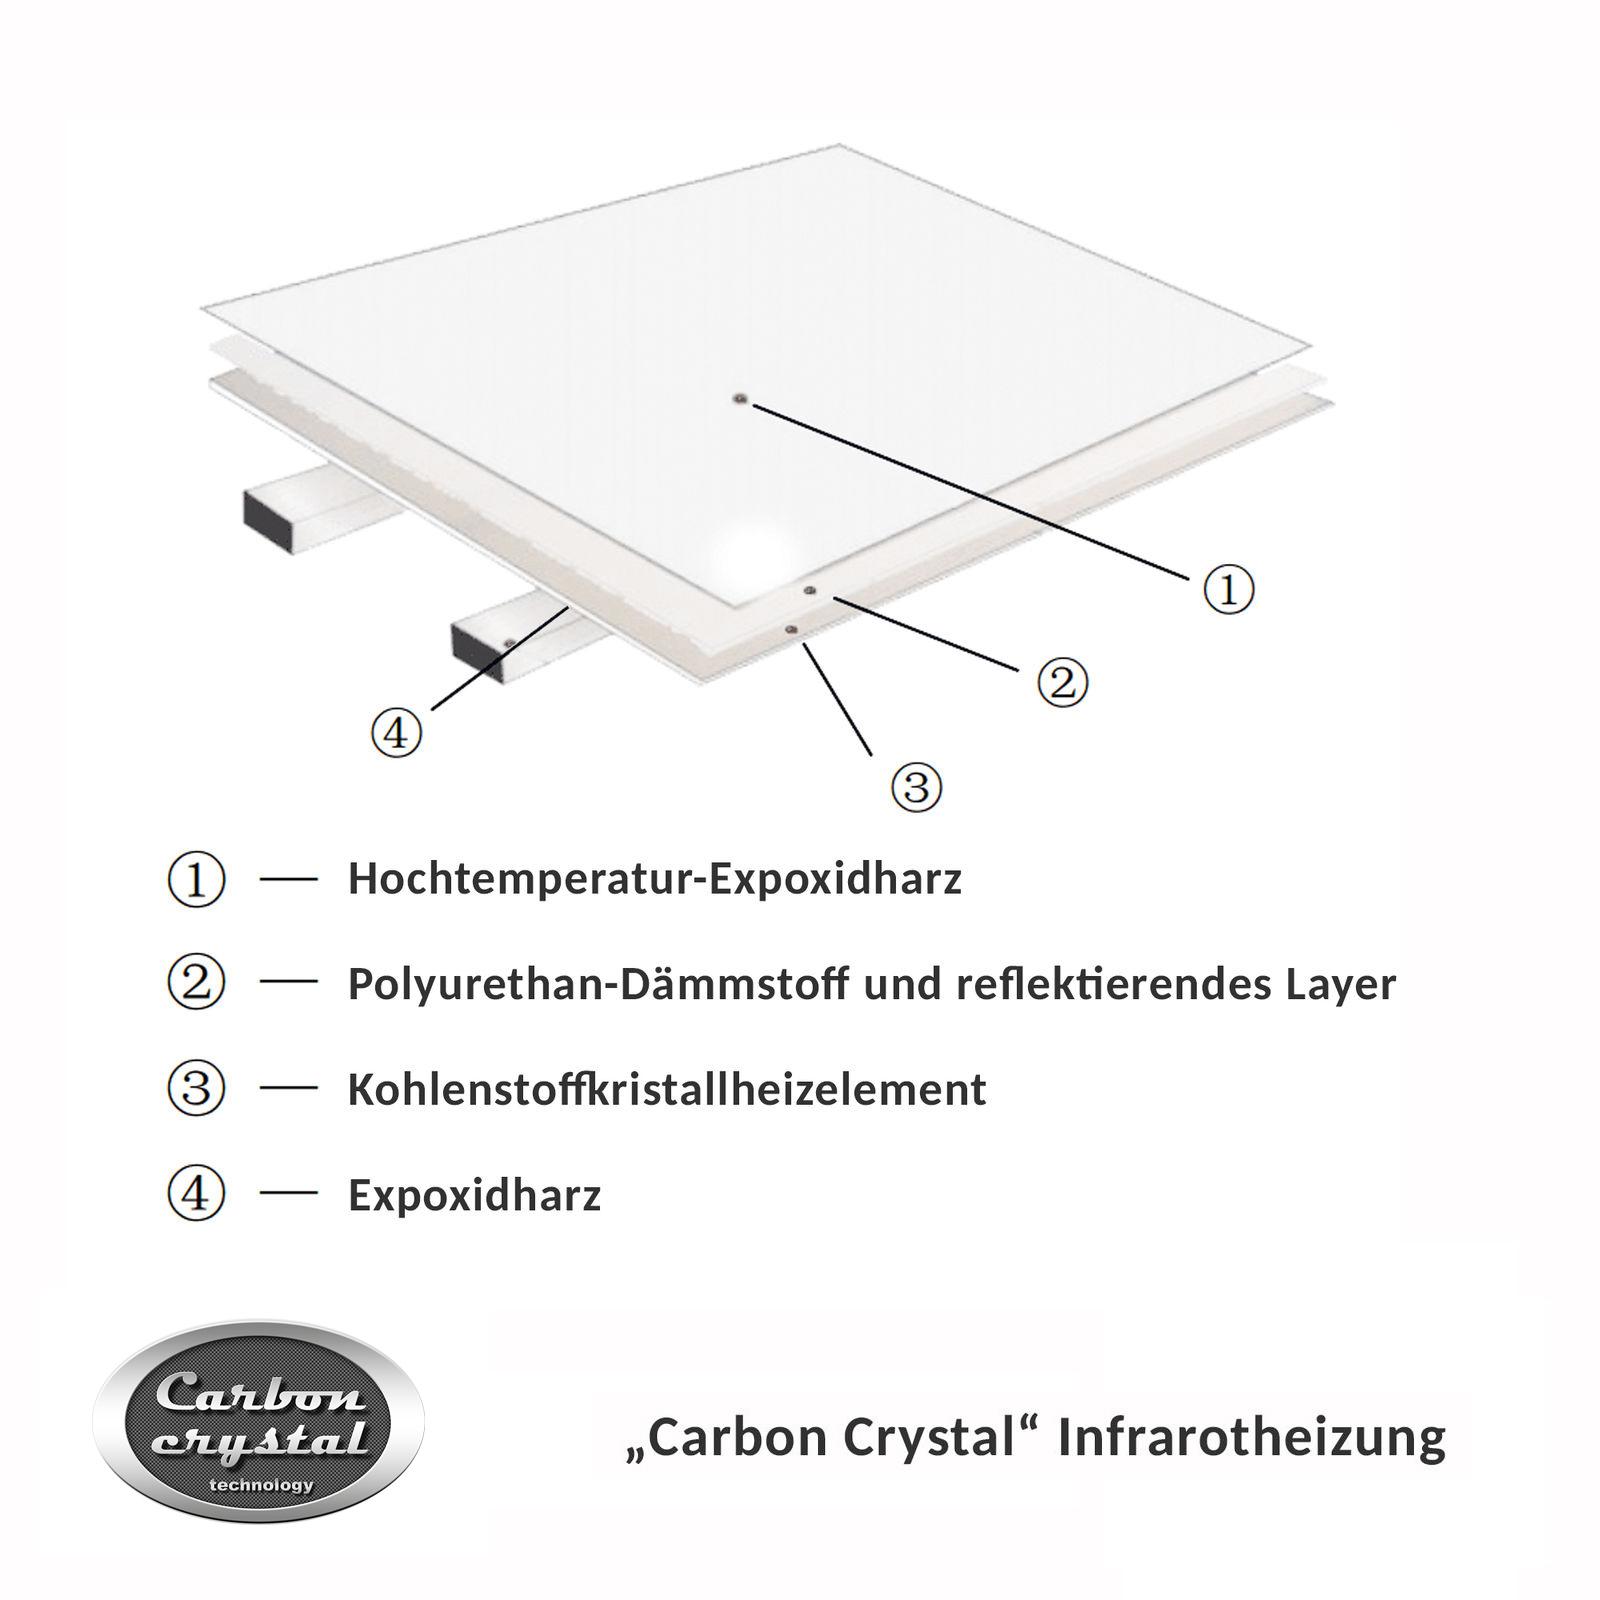 Viesta H600 Infrarotheizung Carbon Crystal (neueste Technologie) Heizpaneel Heizkörper Heizung heating panel ultraflache Wandheizung Weiß - 600 Watt